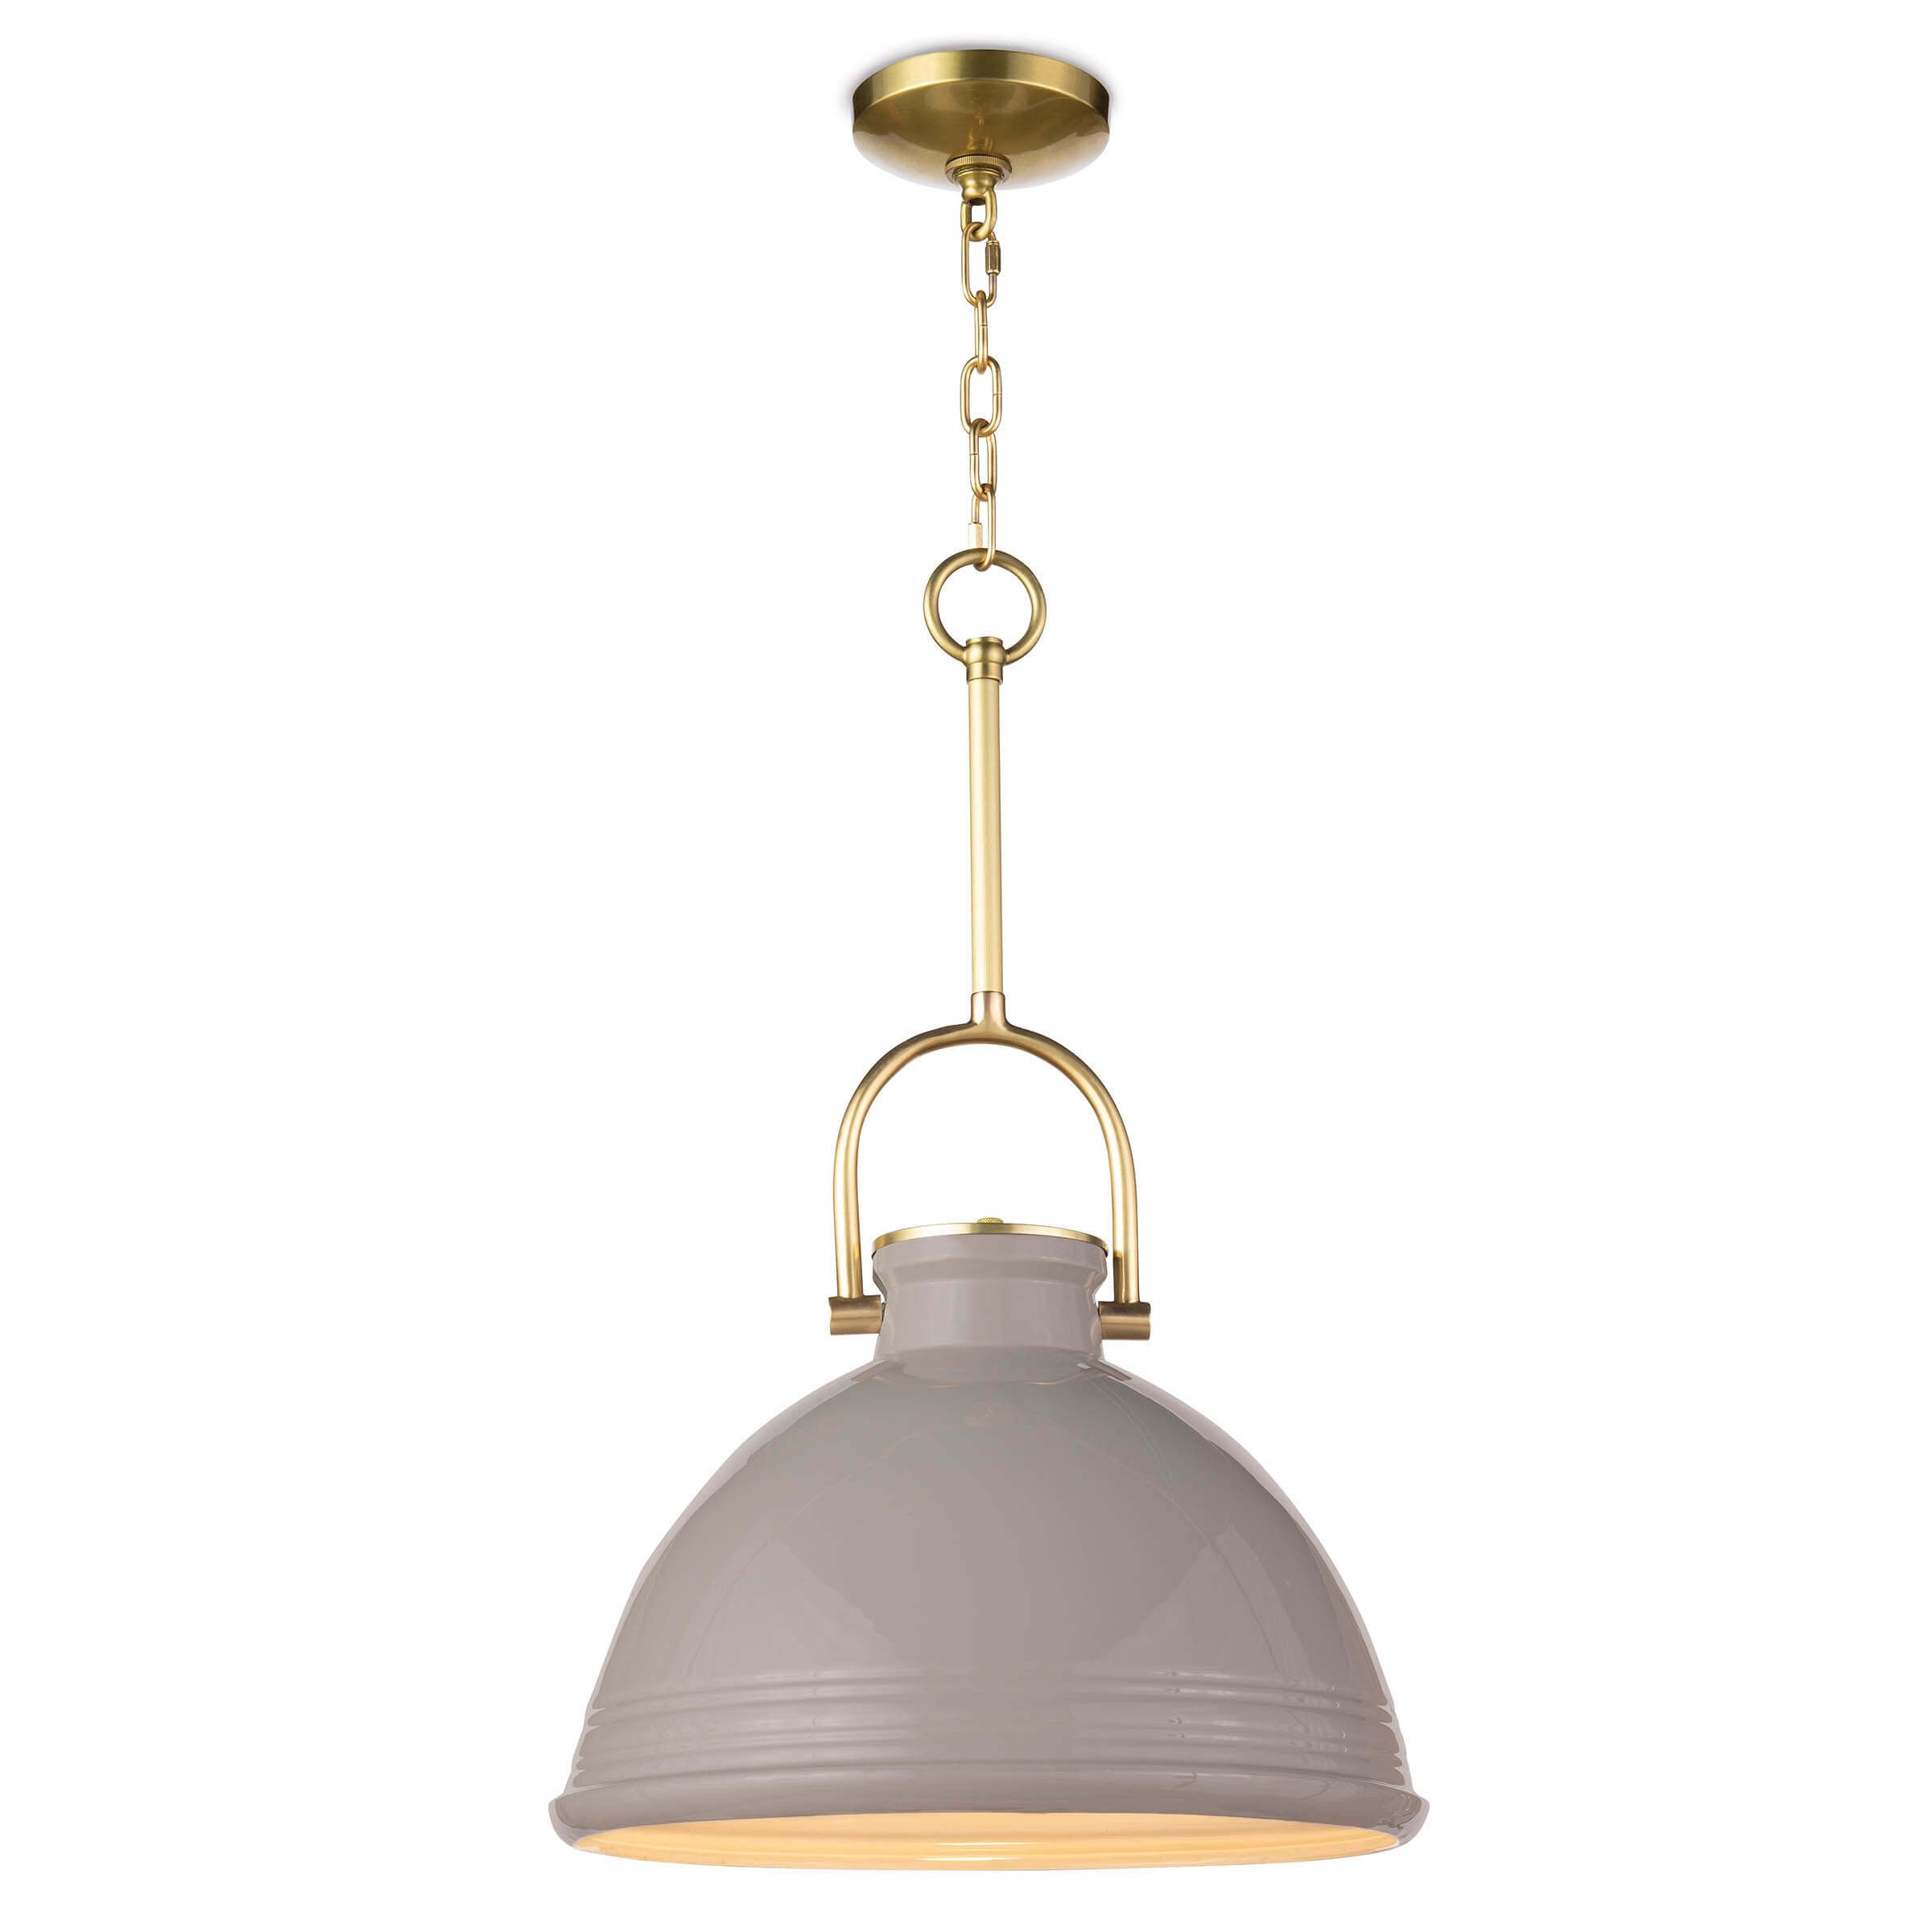 96 Lighting Chandeliers Pendants Sconces Etc Ideas In 2021 Lighting Sconces Lights